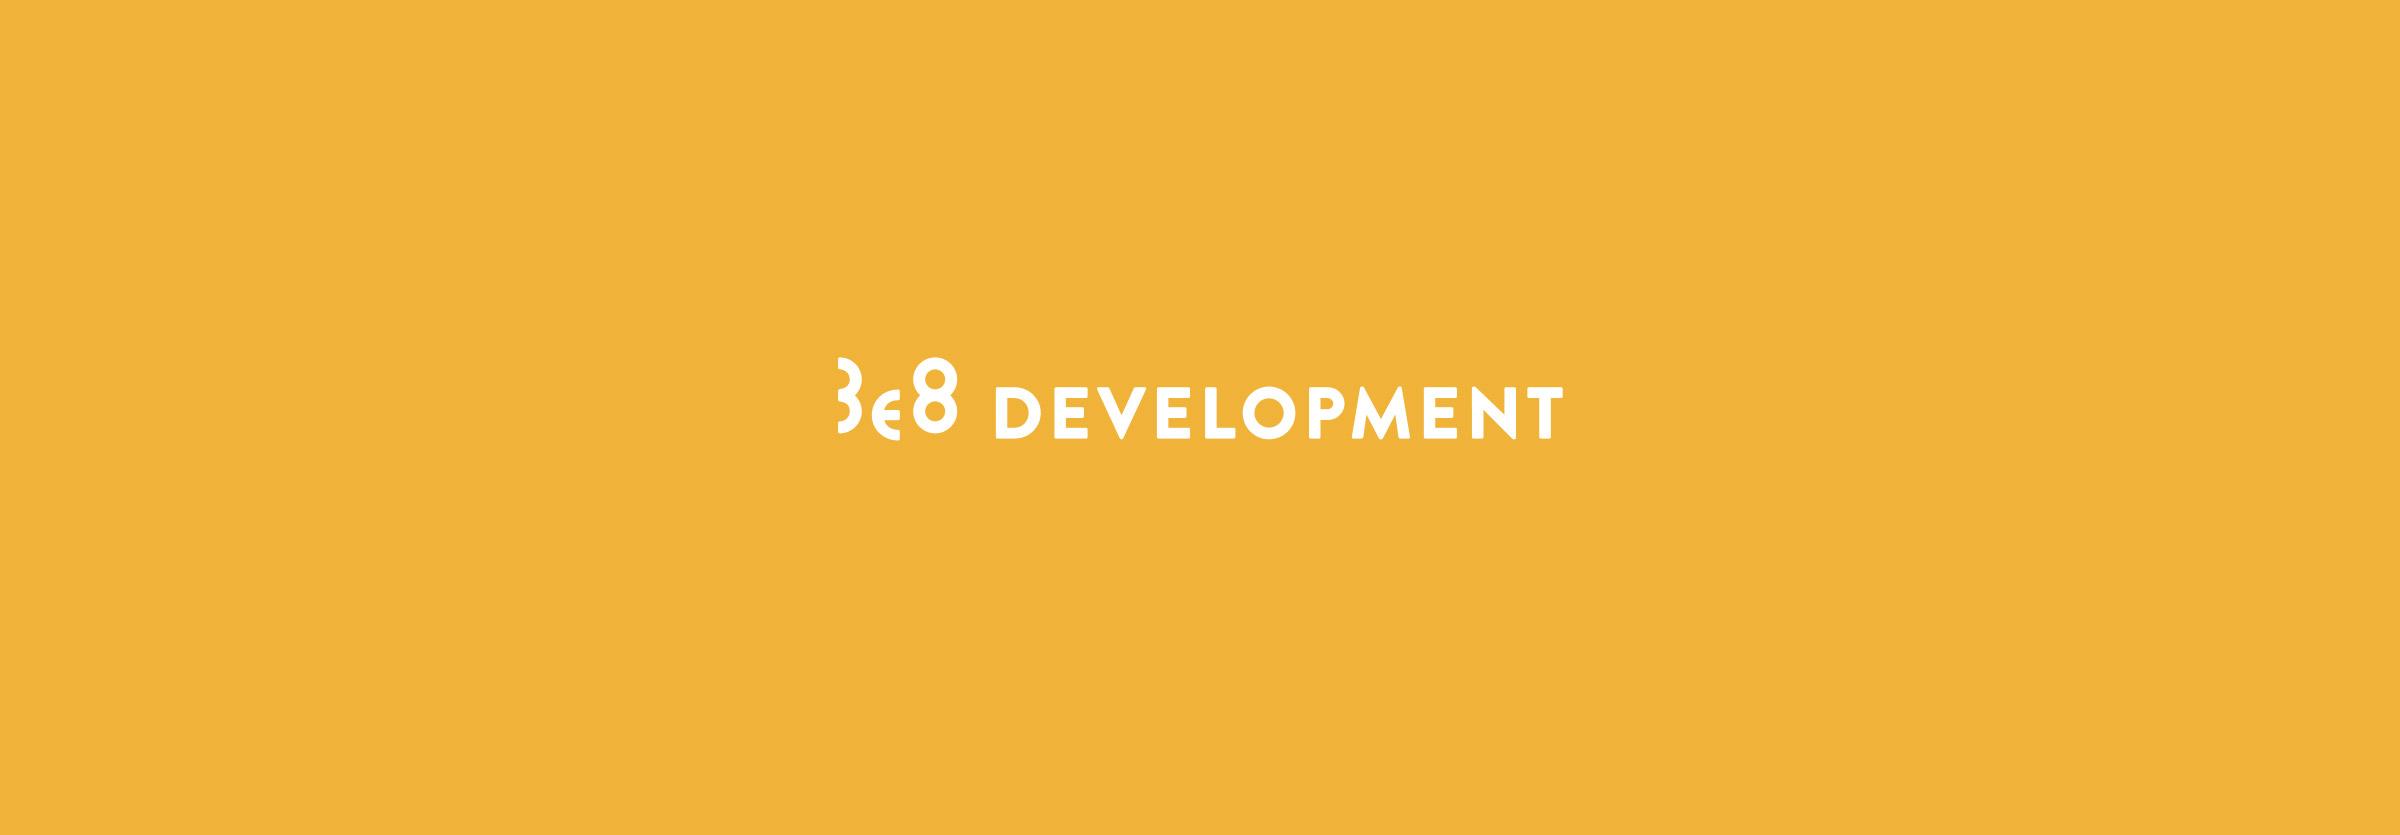 Image 3e8 Logo Type